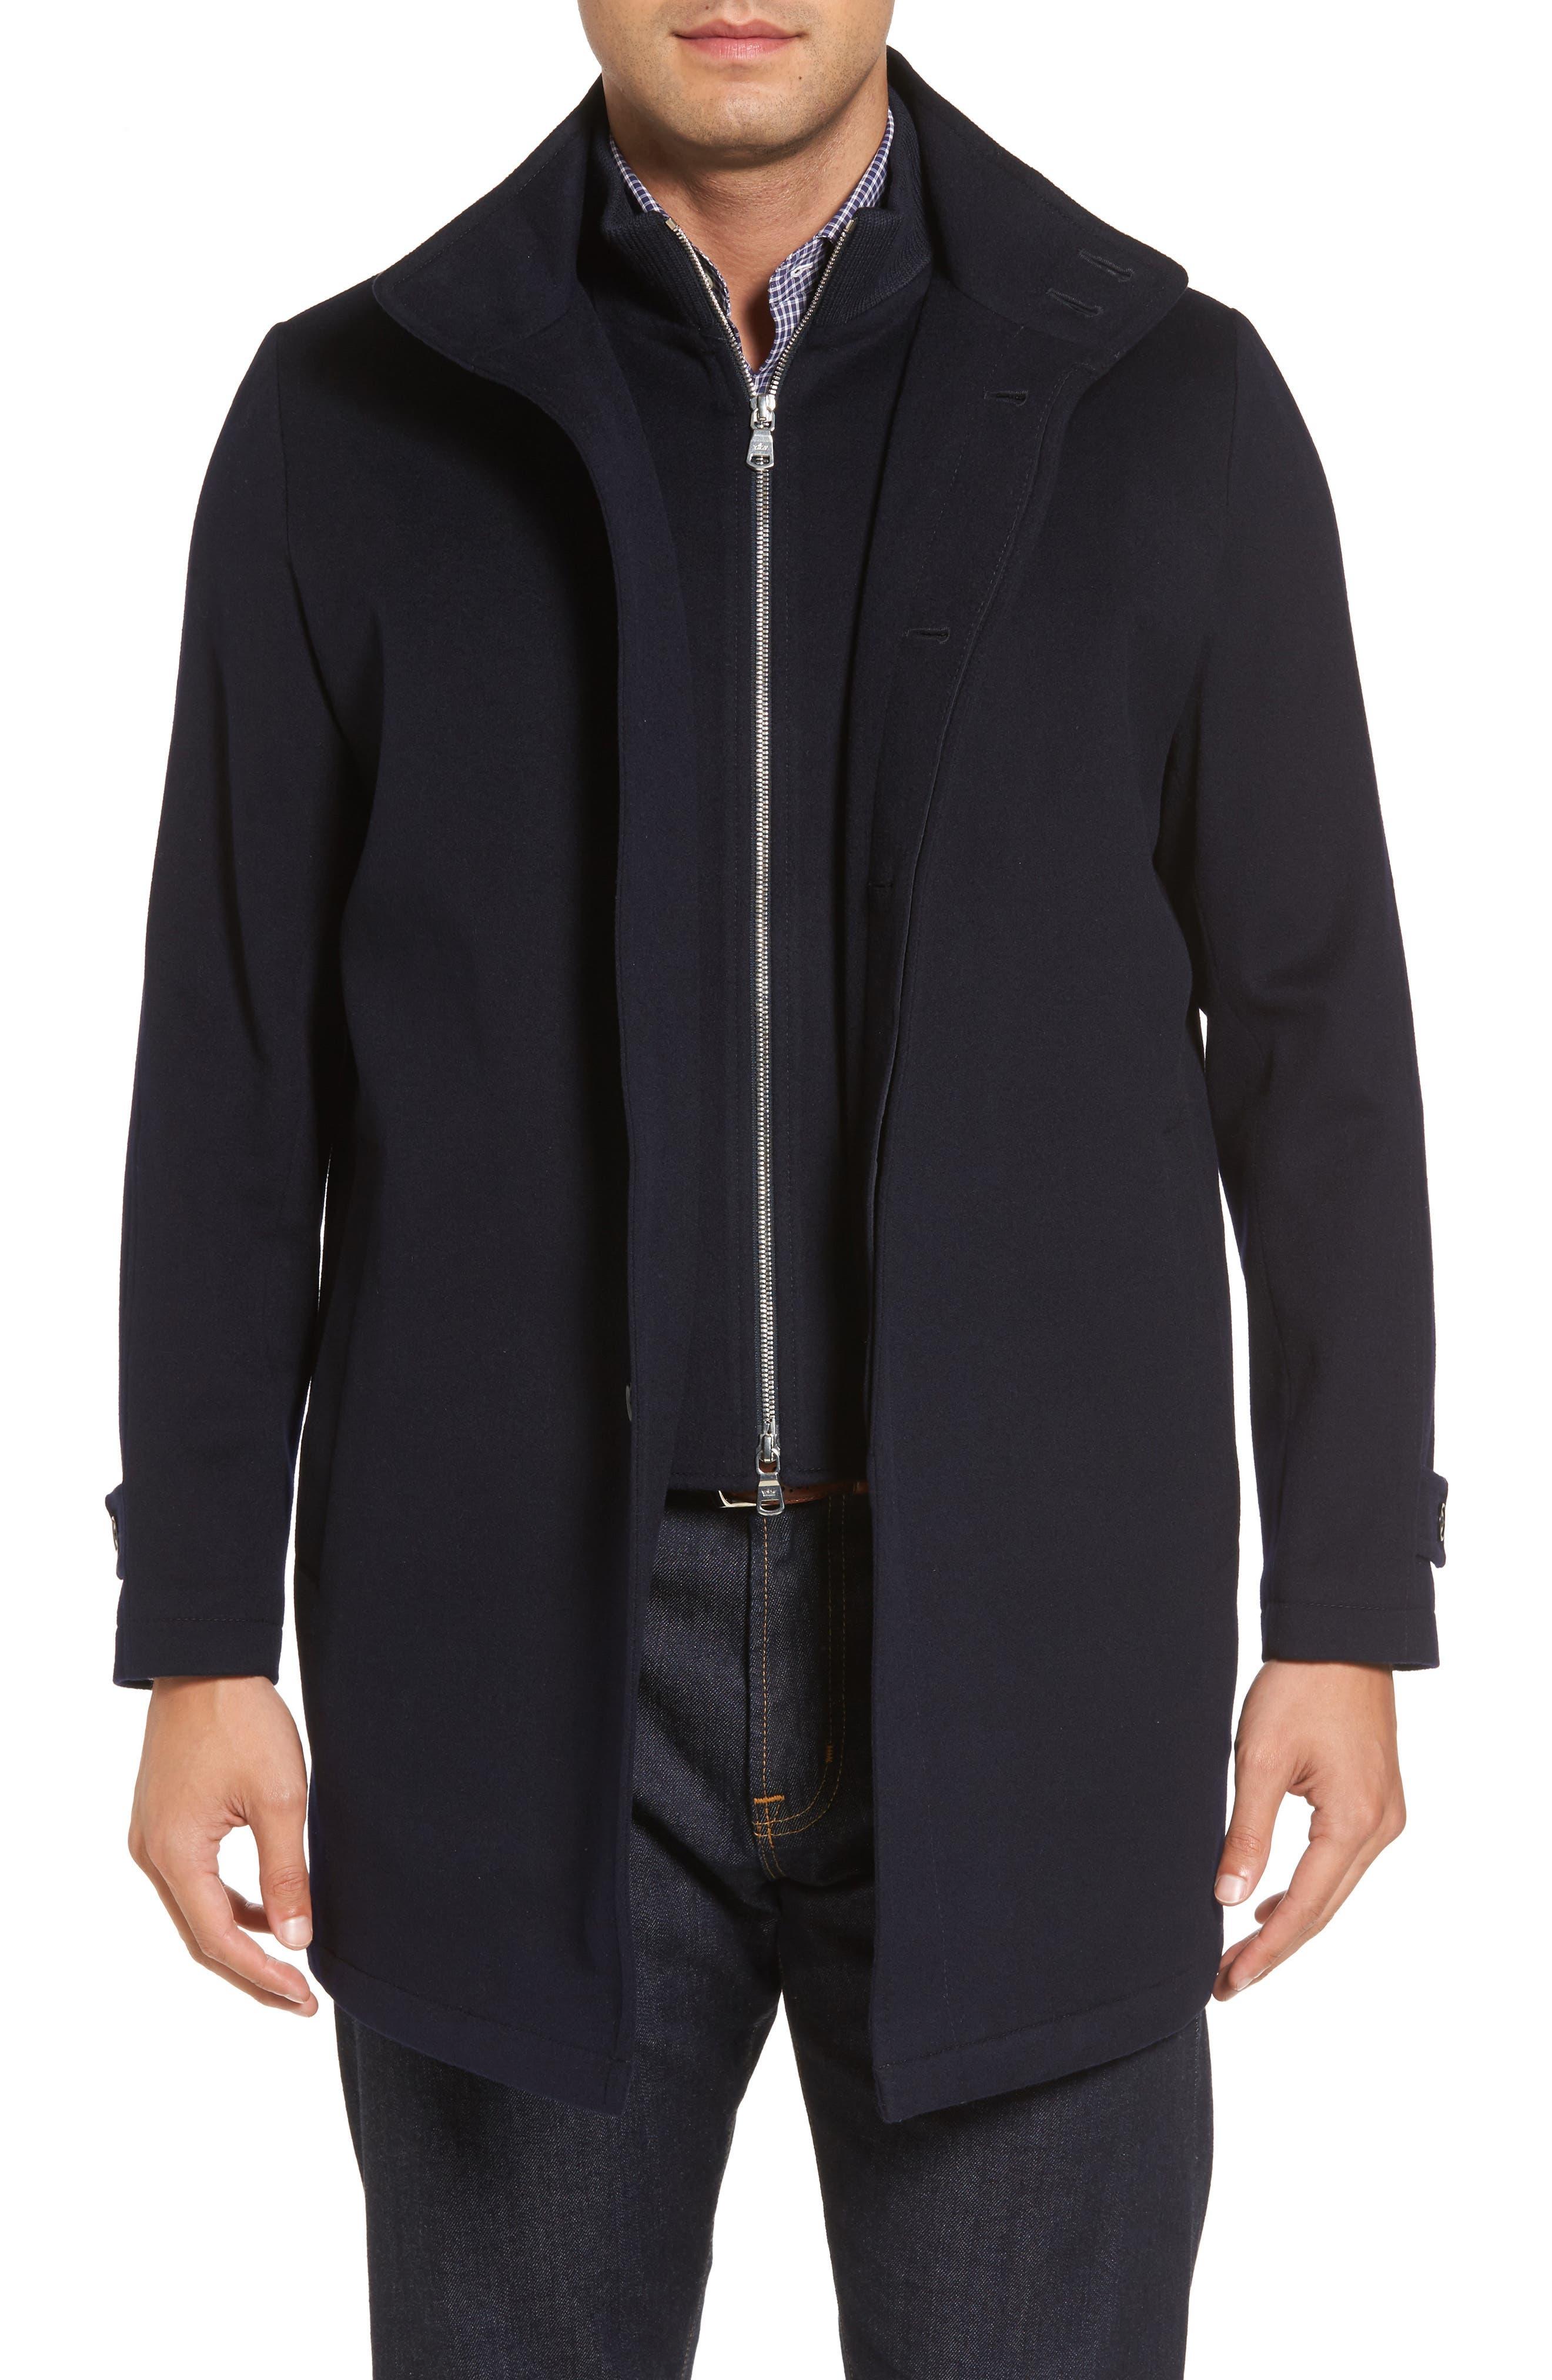 Peter Millar Horizon Wool Overcoat,                         Main,                         color, Black